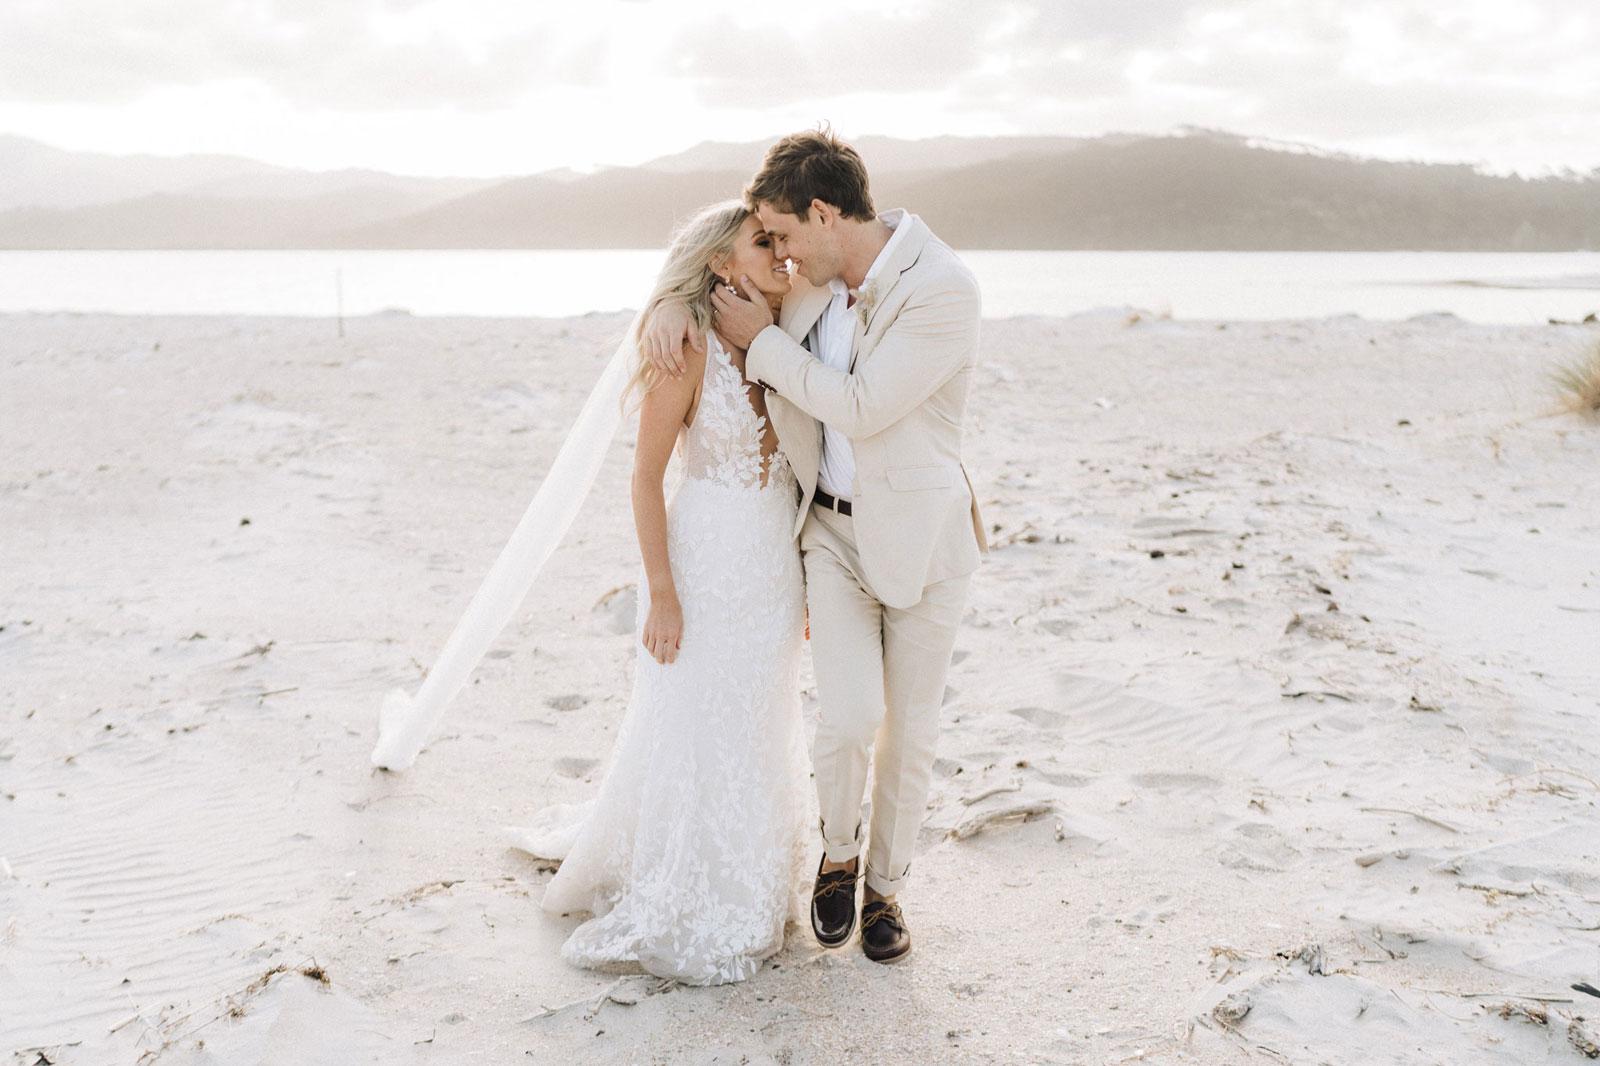 newfound-k-b-coromandel-wedding-photographers-087